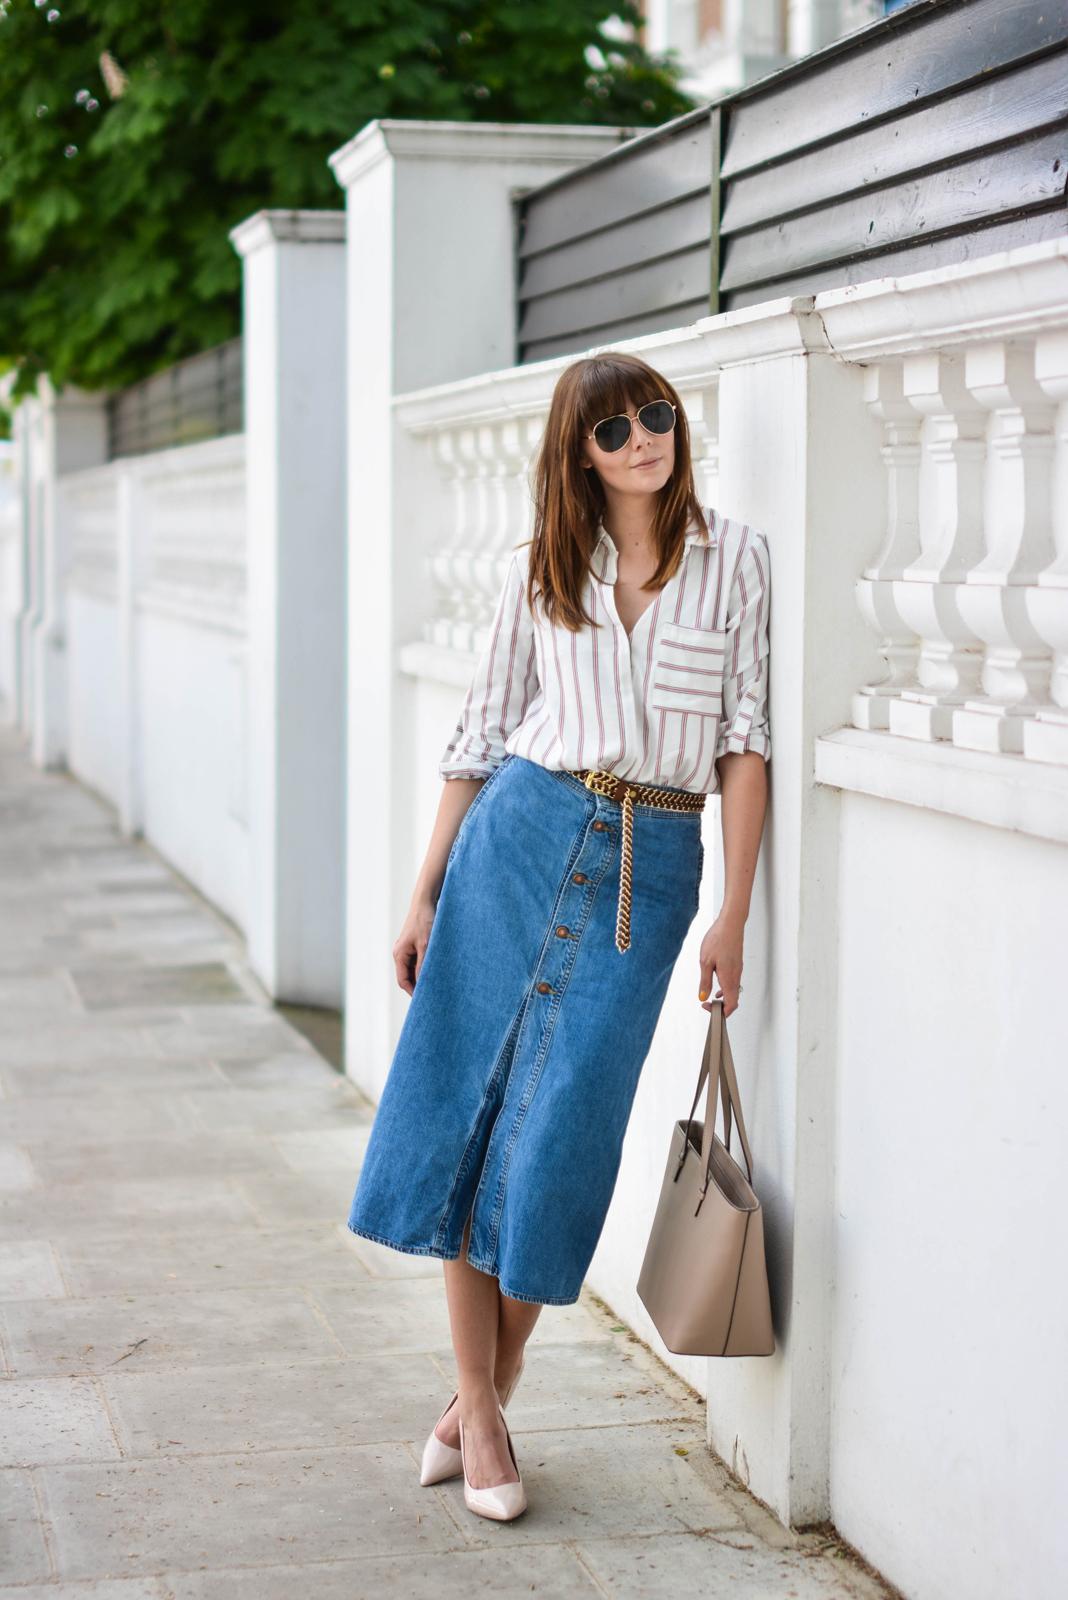 EJSTYLE - Emma Hill wears Zara denim a line button midi skirt, Zara 70s stripe shirt, Nude pointed court shoes, Mango beige tote bag, tan suede gold chain belt, OOTD